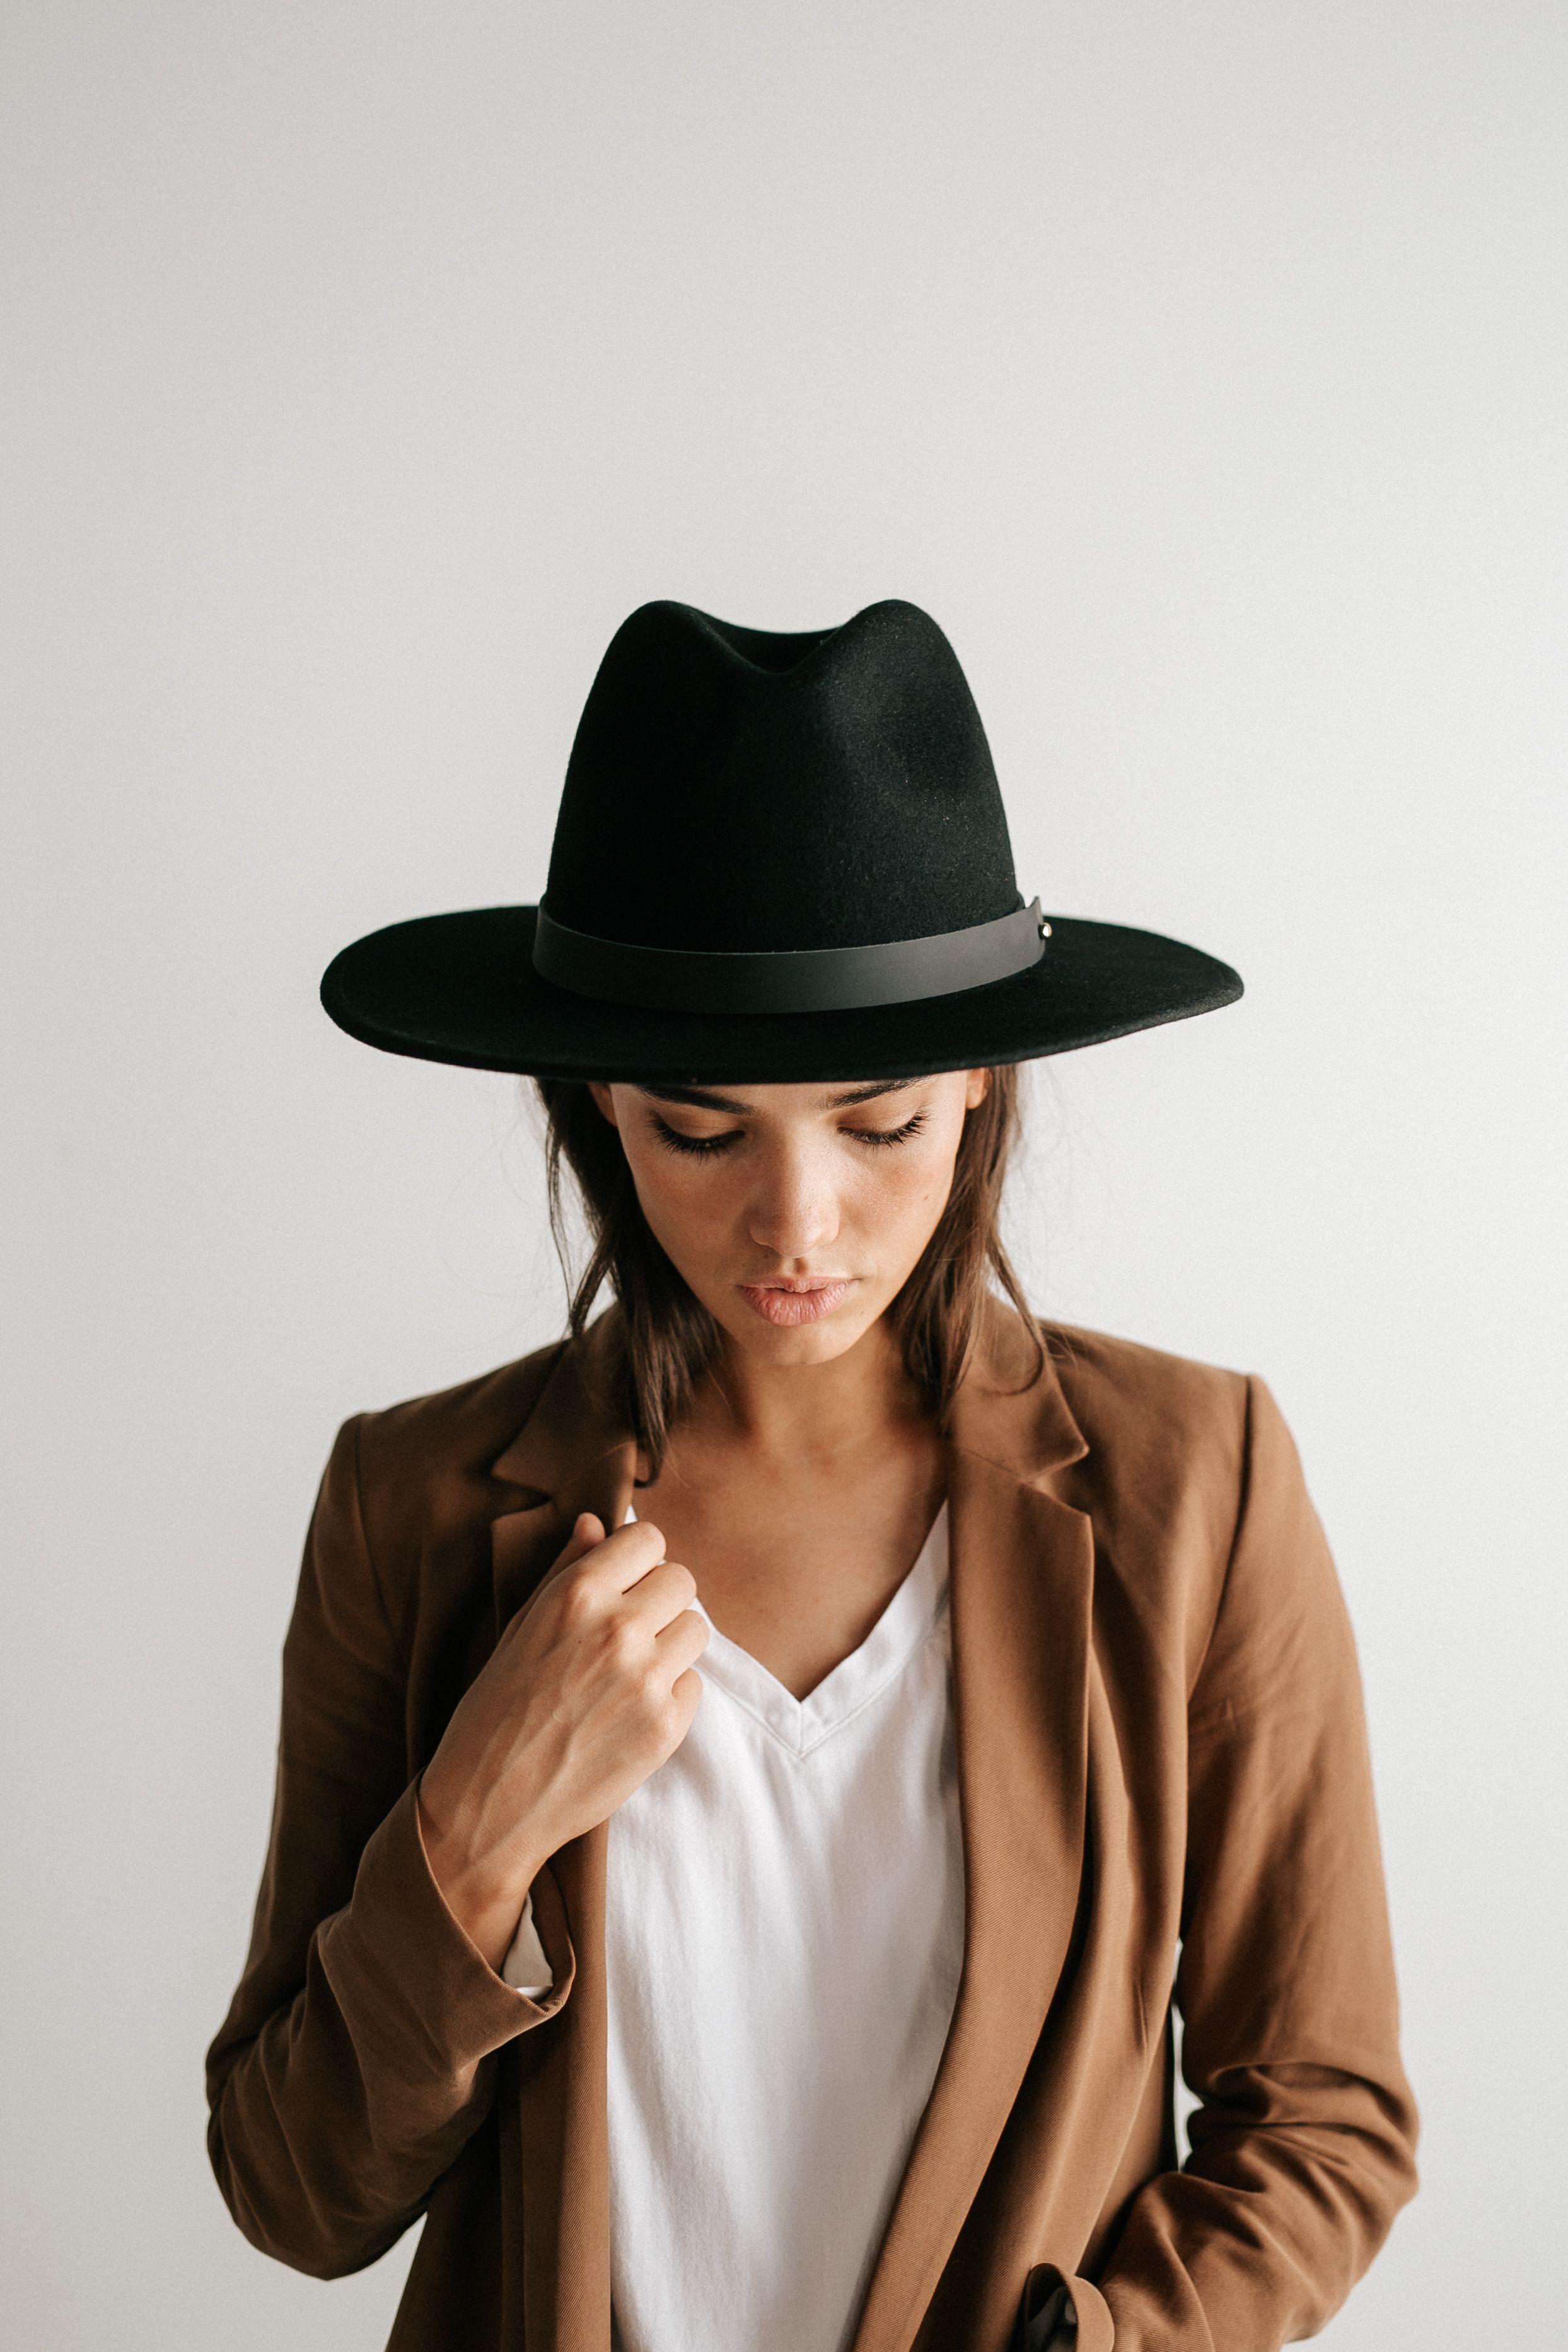 Goorin Mishka Fedora Hat In Forest Size Large Fedora Hats For Men Womens Fedora